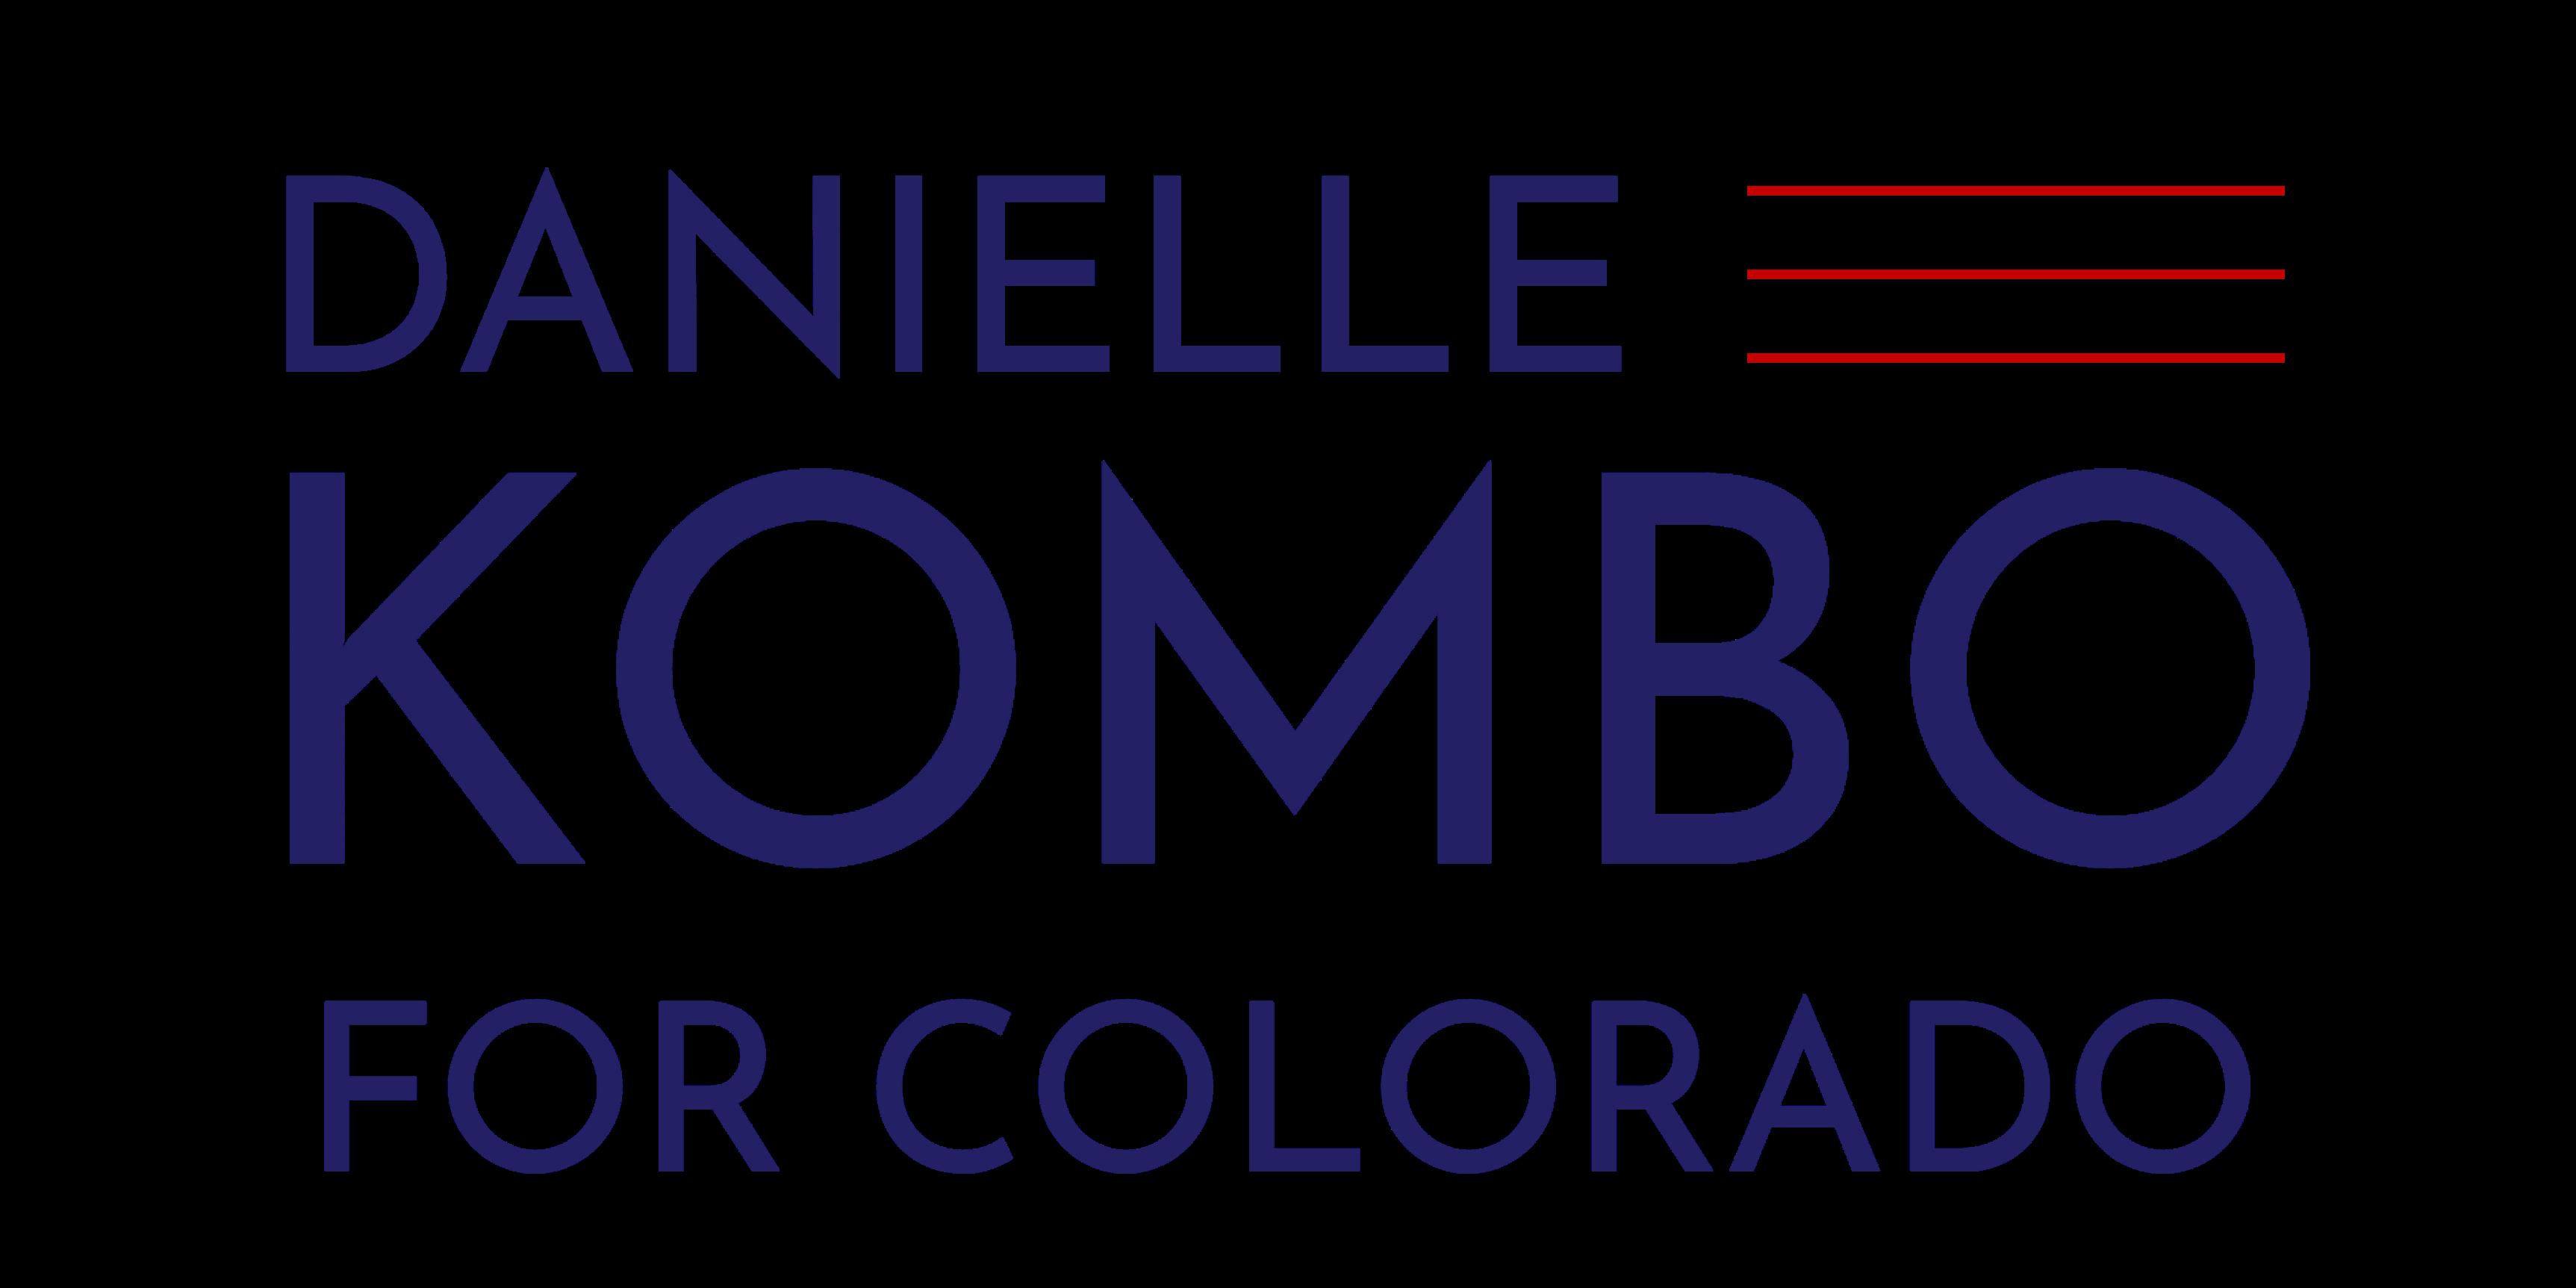 Danielle Kombo